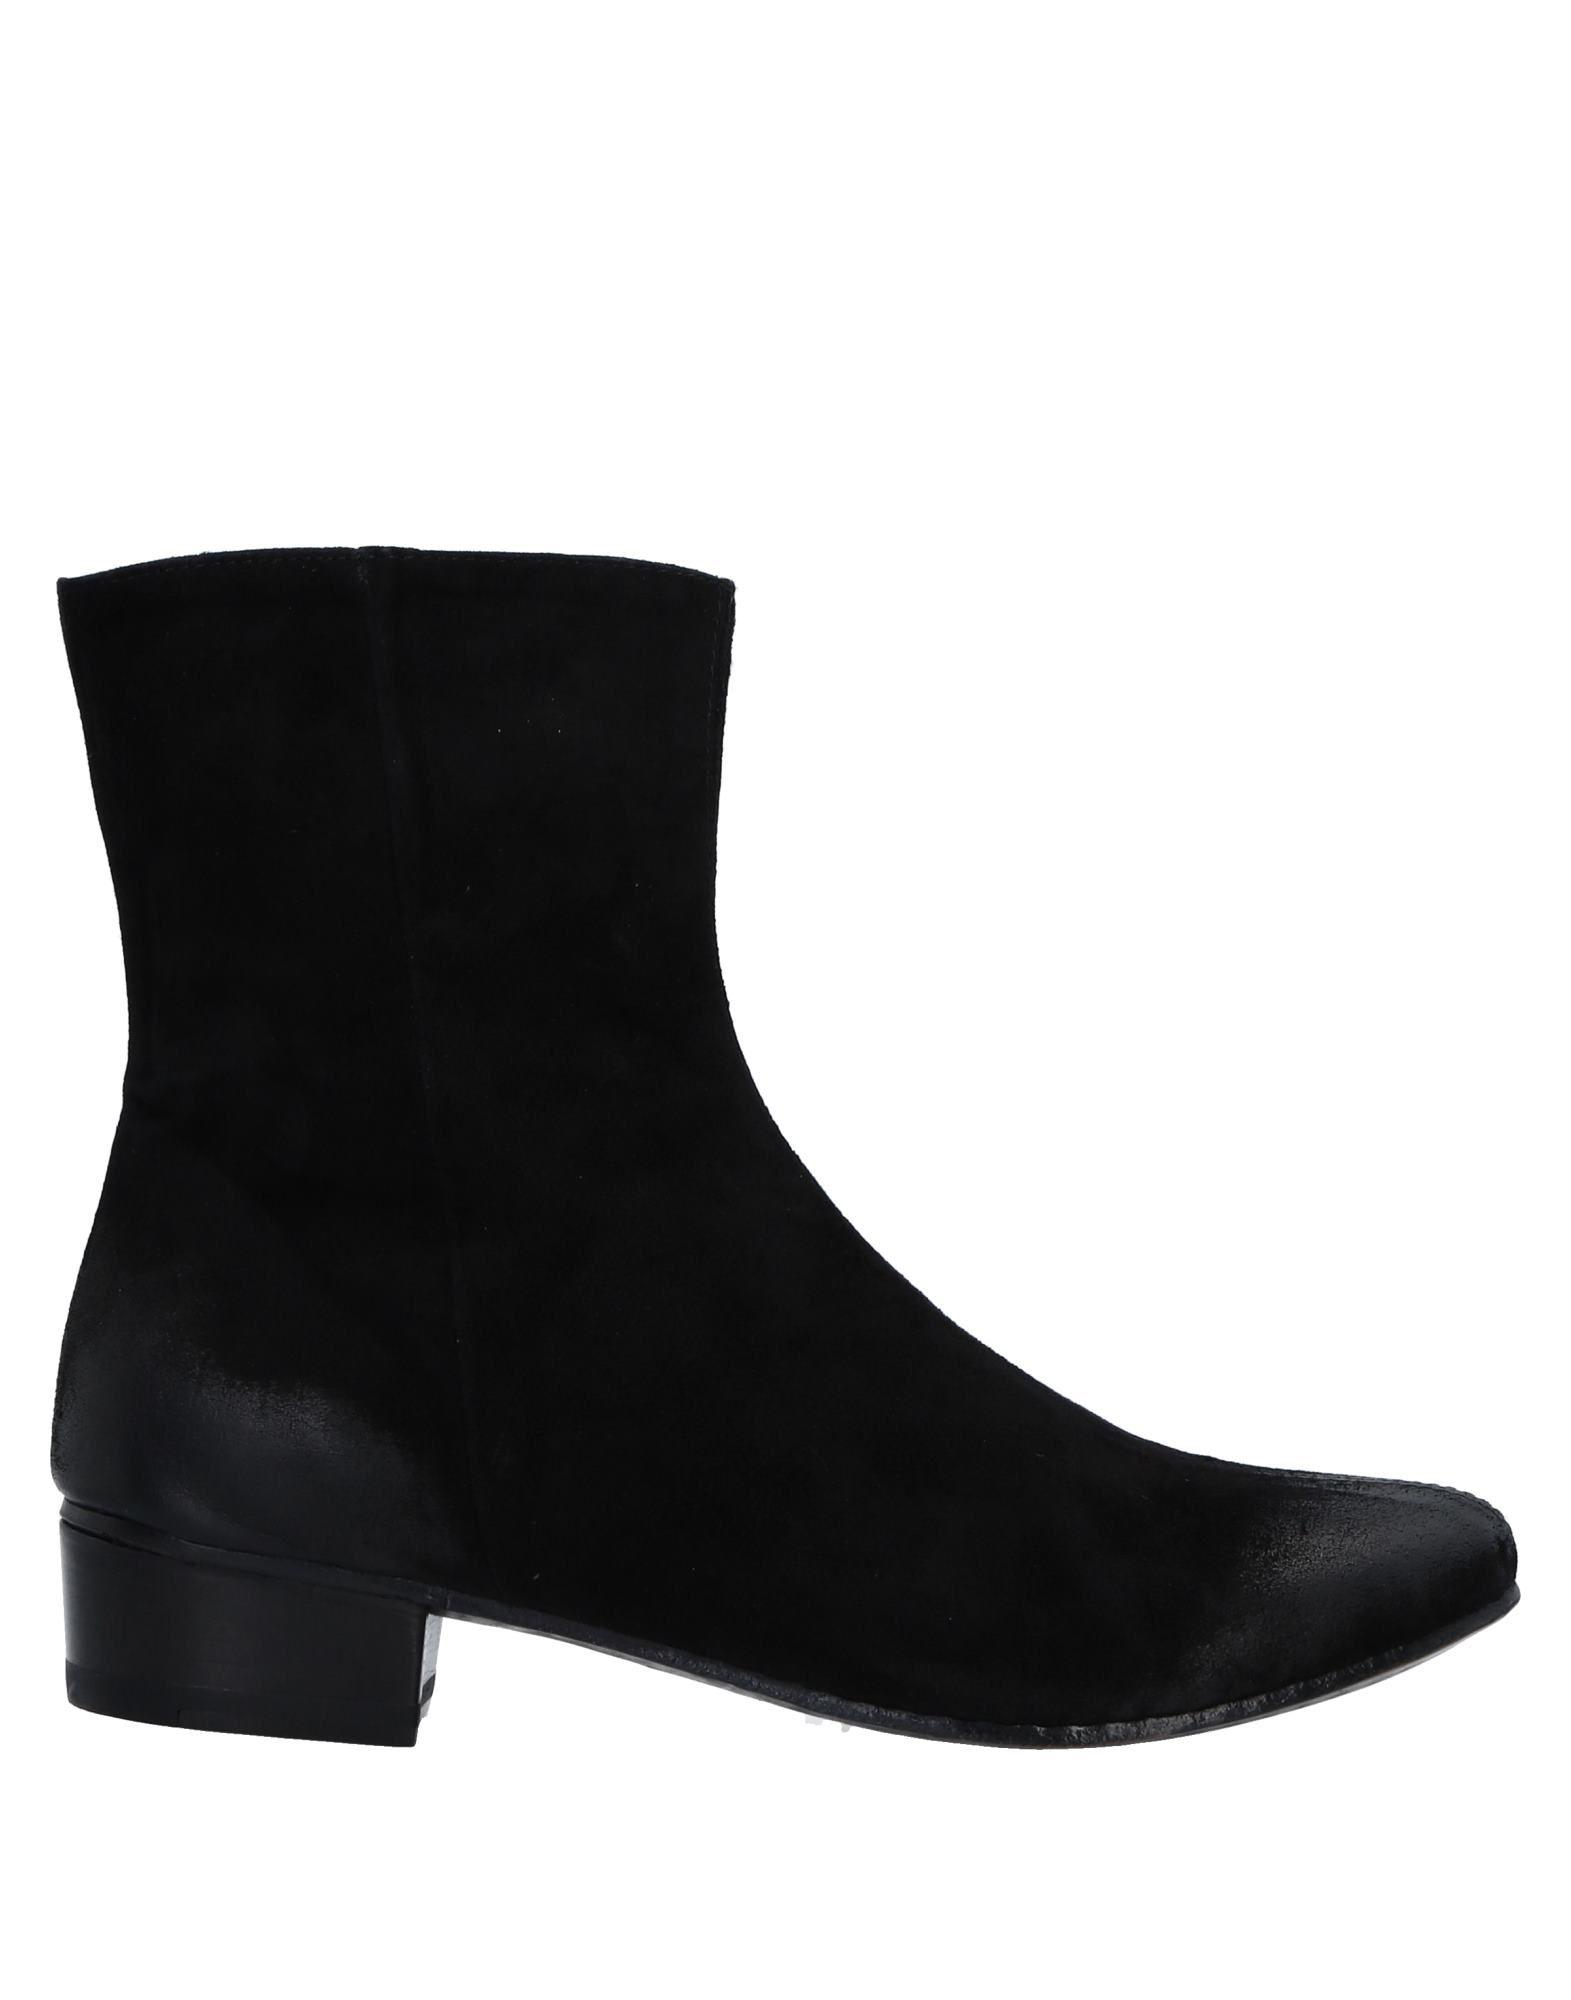 Kudetà Boot Ankle Boot Kudetà - Women Kudetà Ankle Boots online on  United Kingdom - 11539790SW 56ad7f